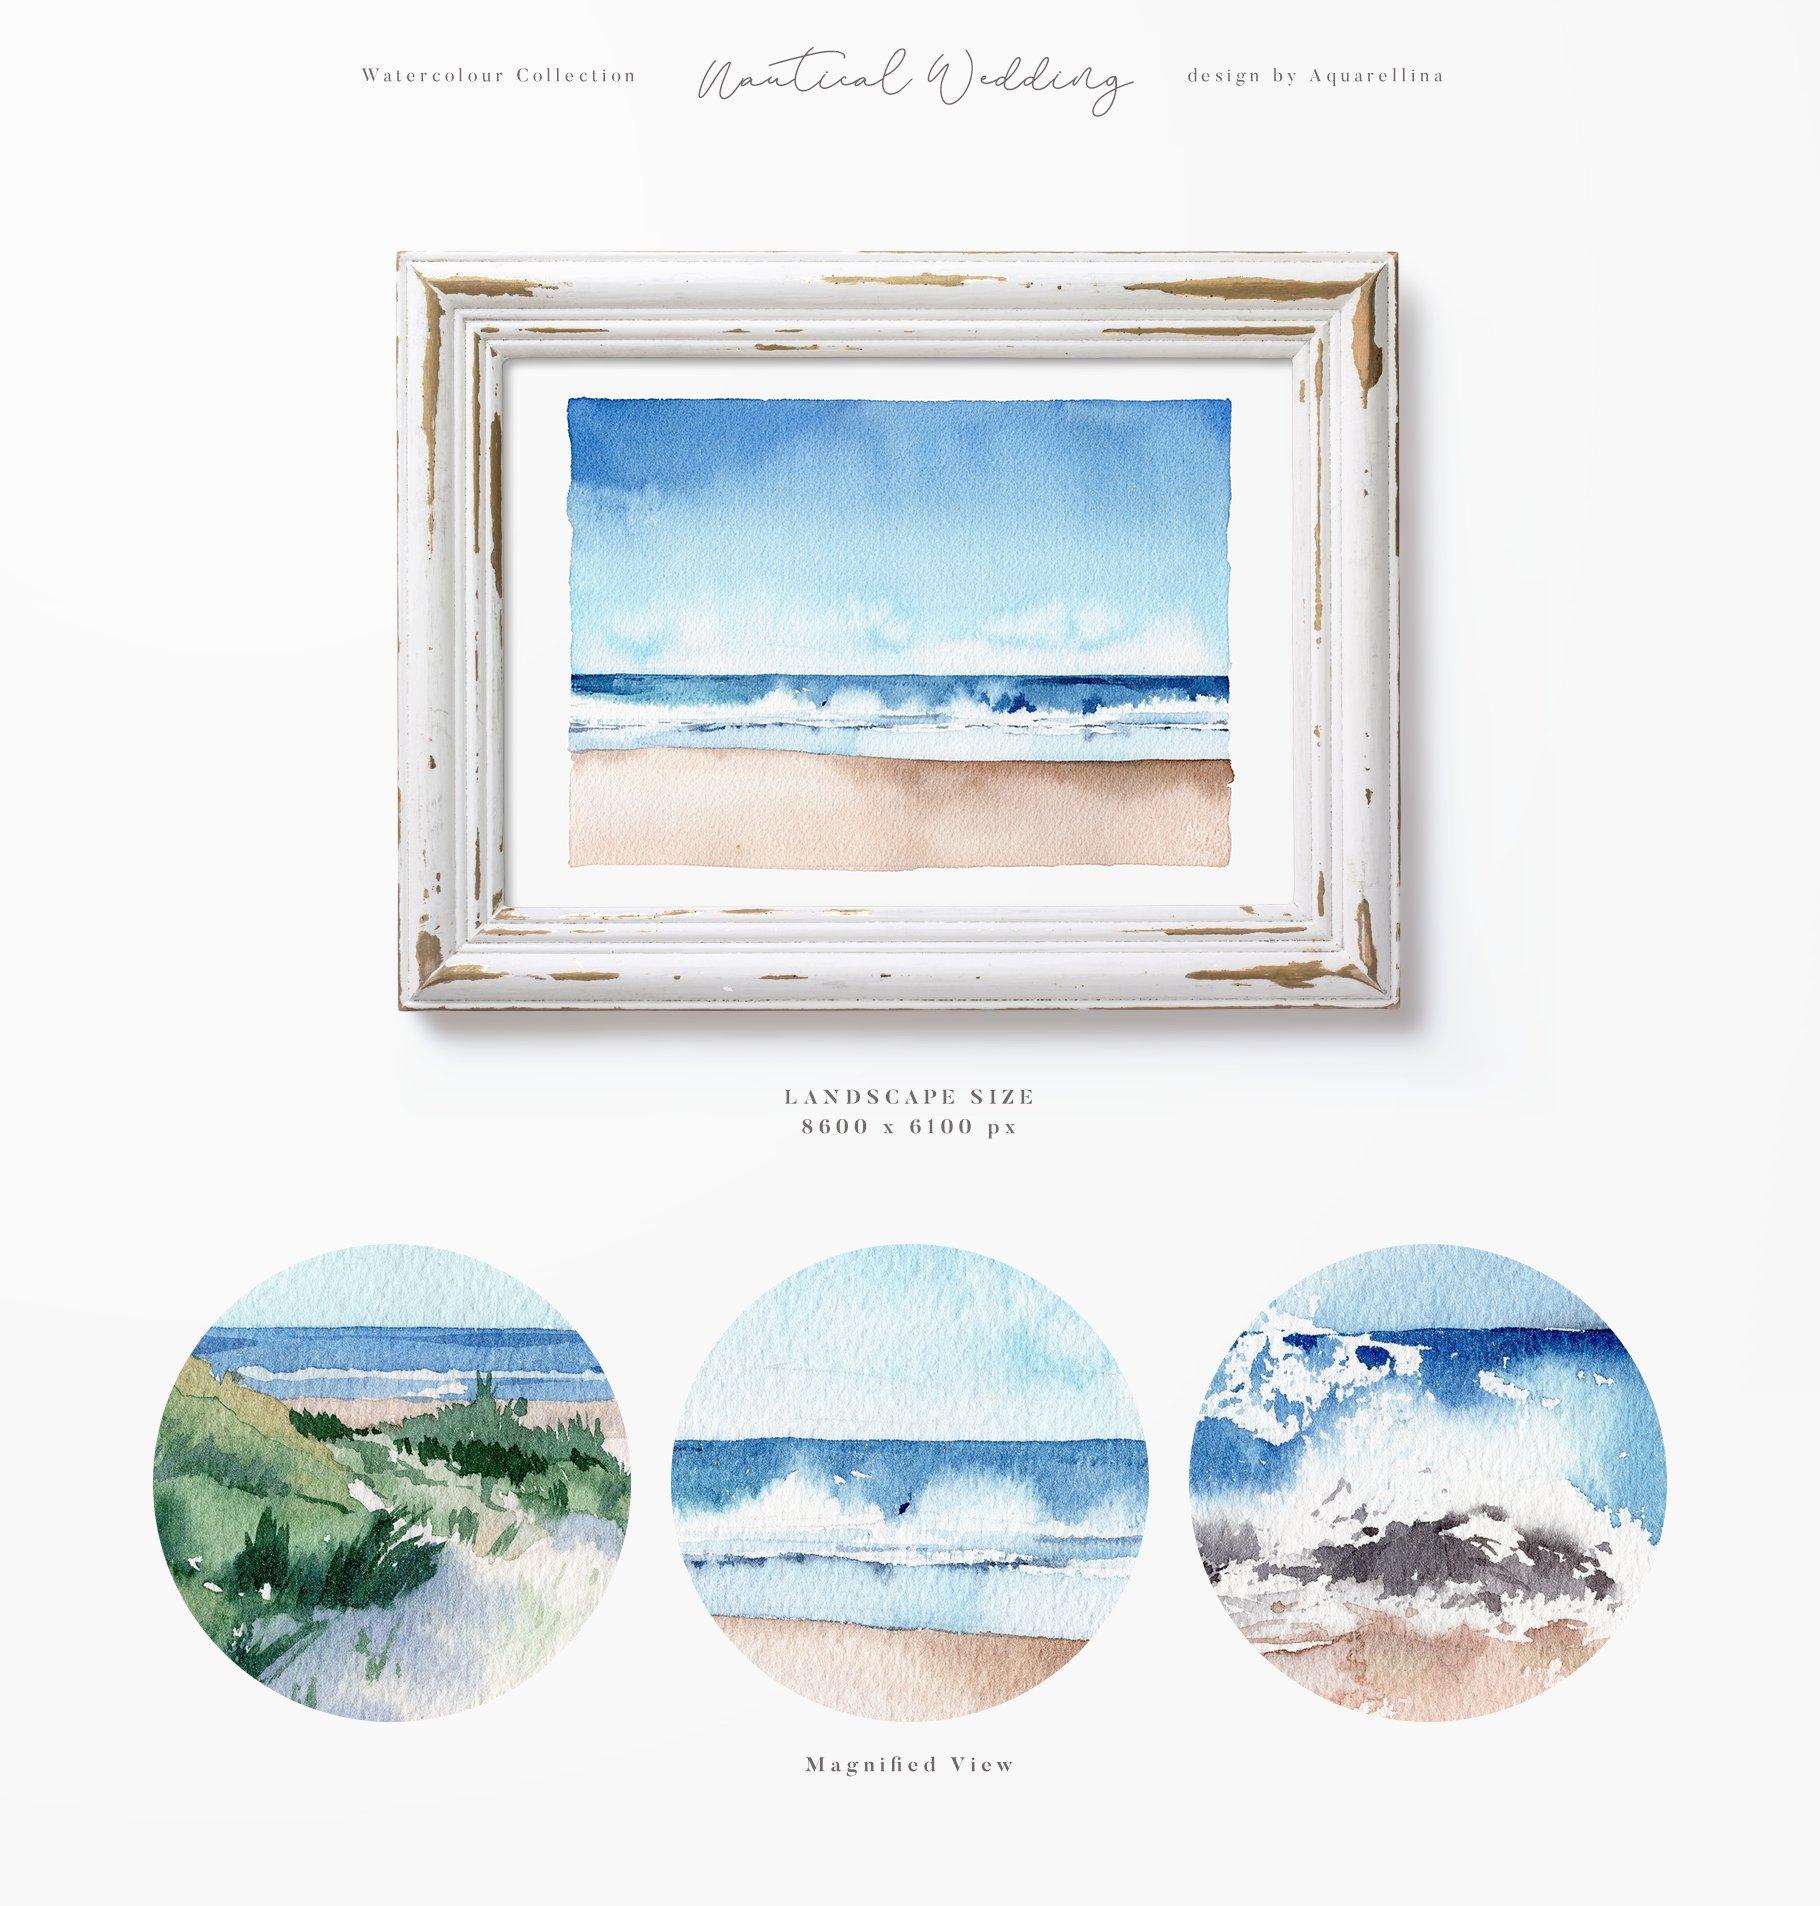 nautical beach wedding illustrations by aquarellina screenshot 2 5